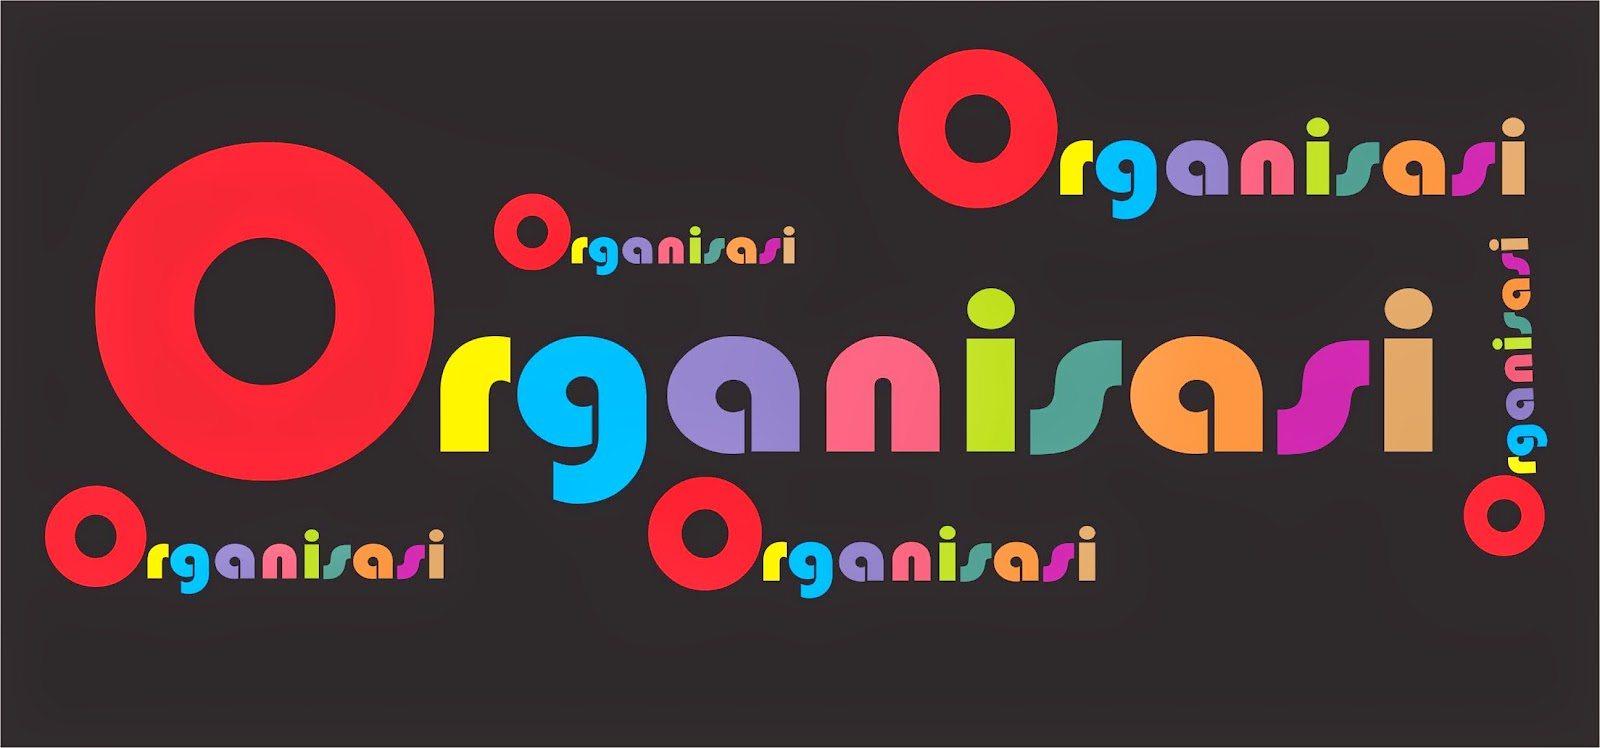 Jasa website organisasi Depok 082225316999